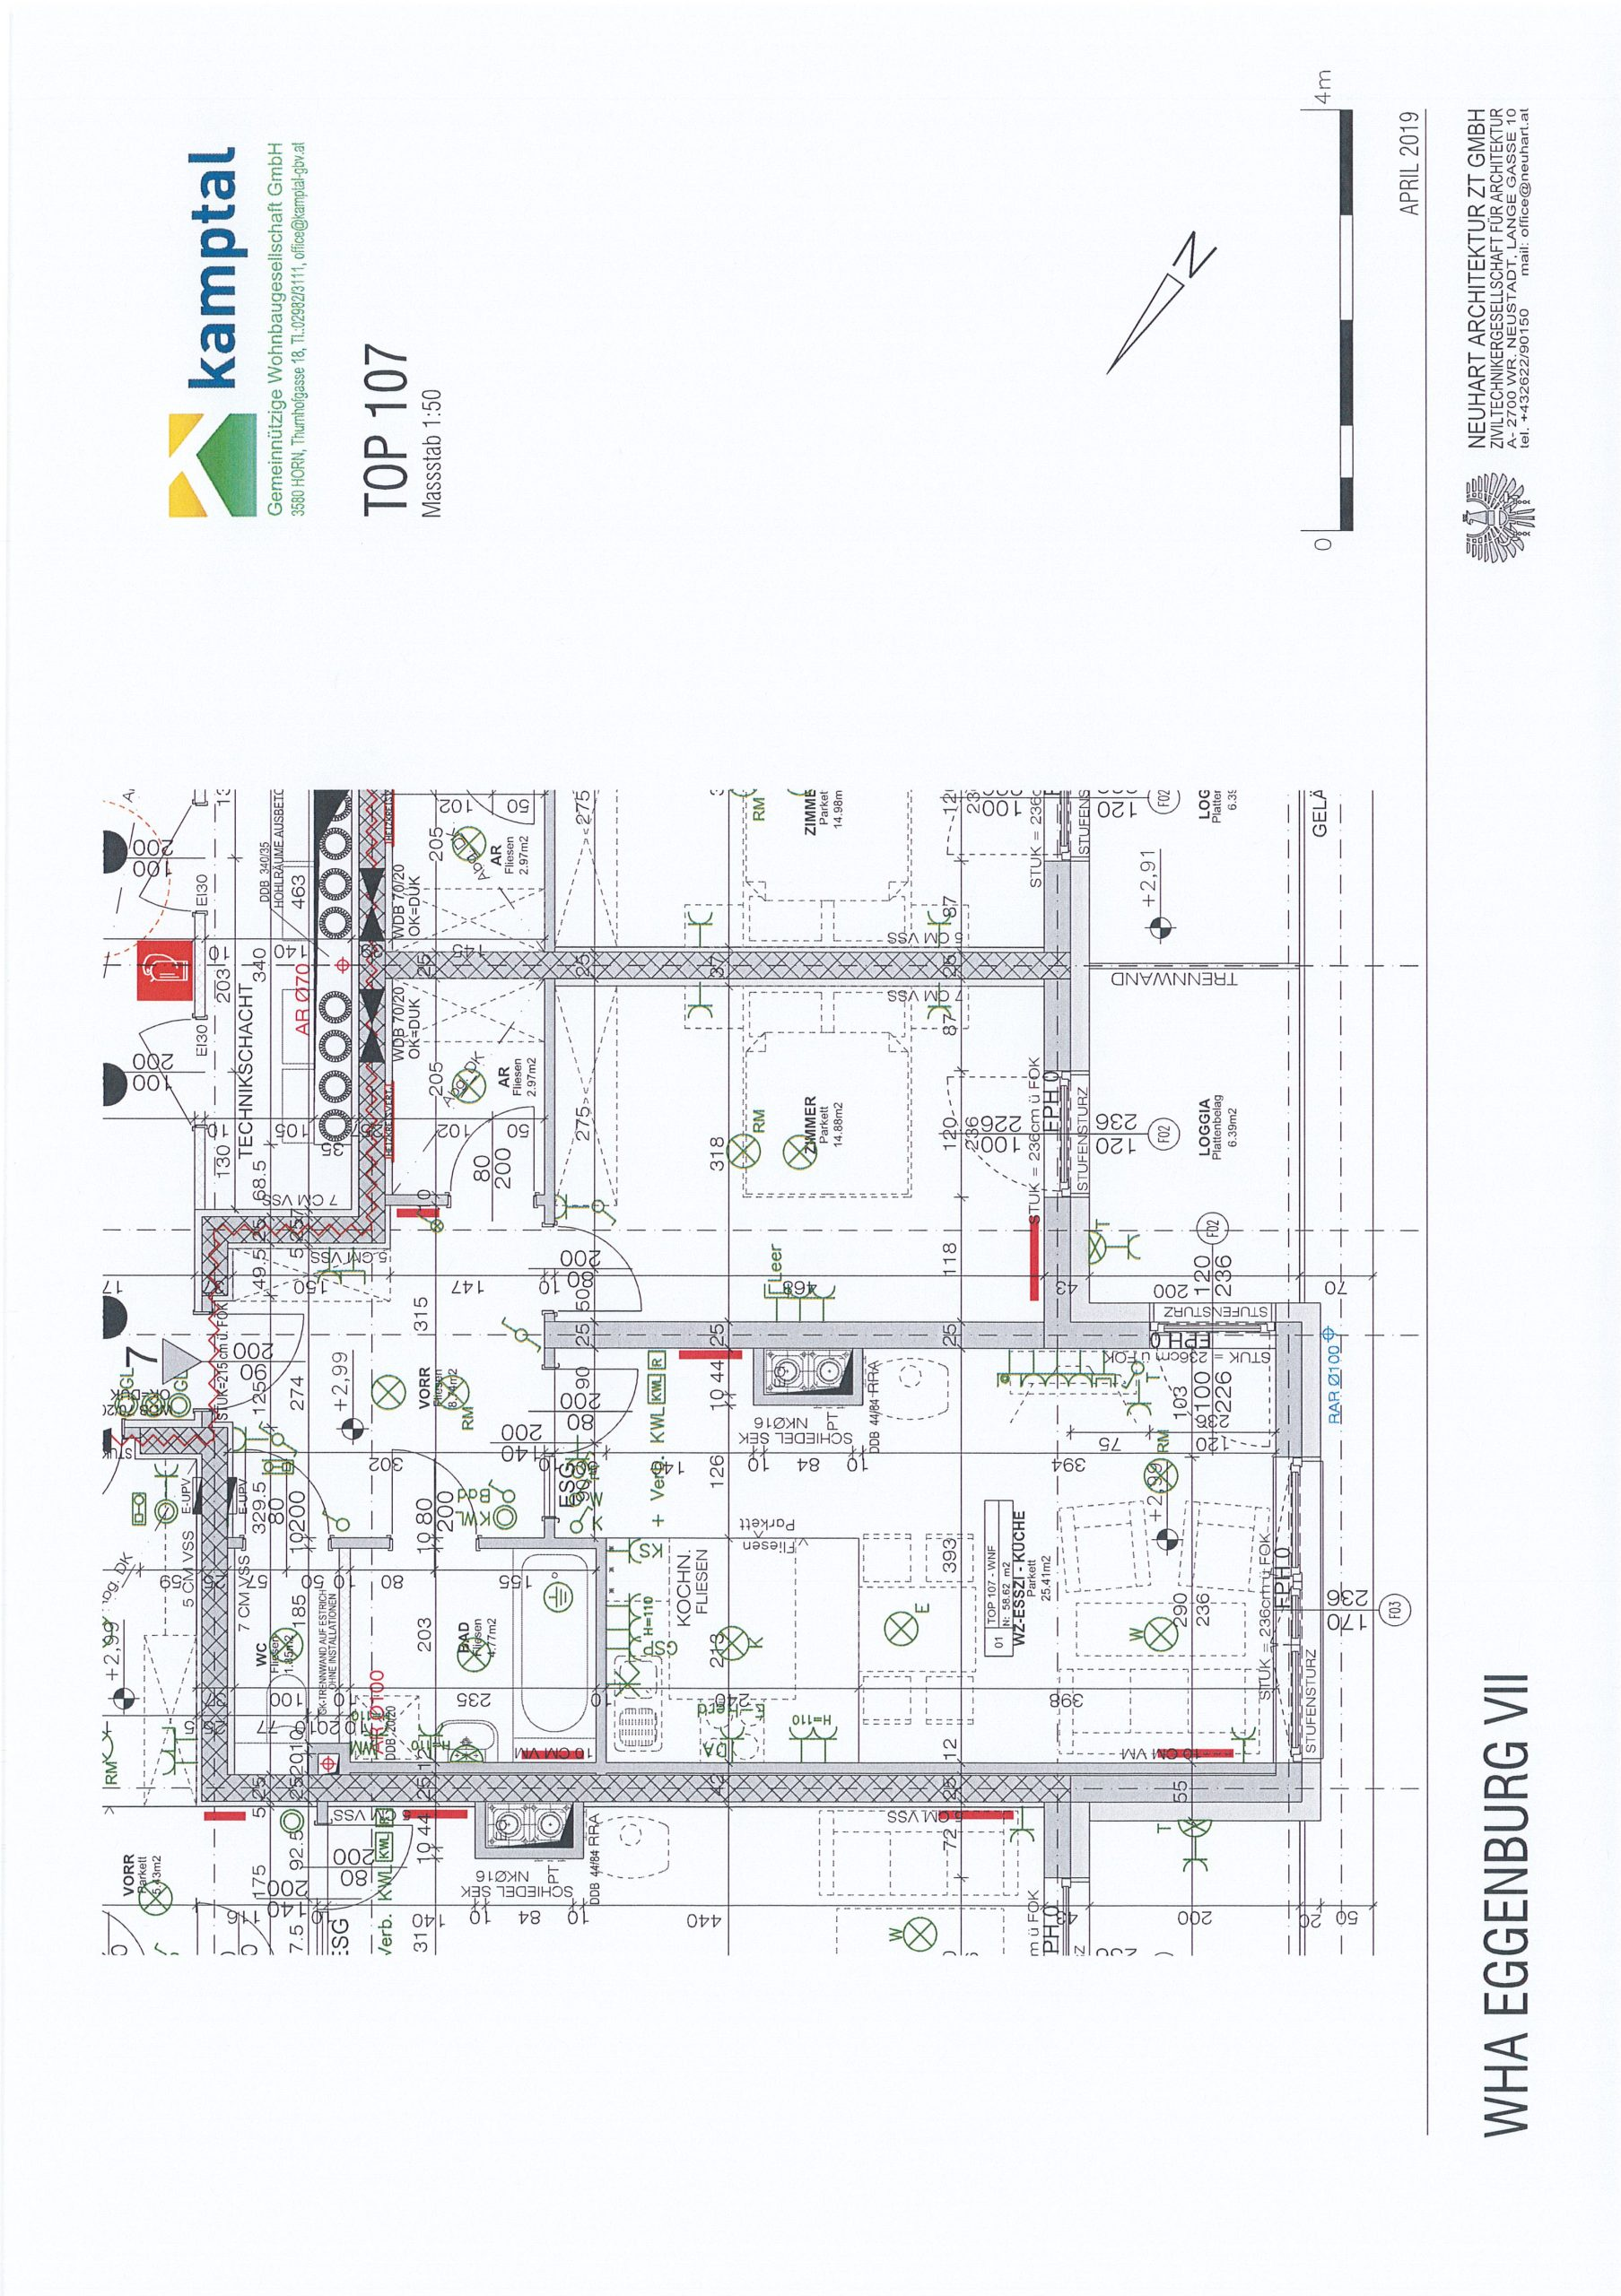 Immobilie von Kamptal in 3730 Eggenburg, Horn, Eggenburg VII - Top 107 #10